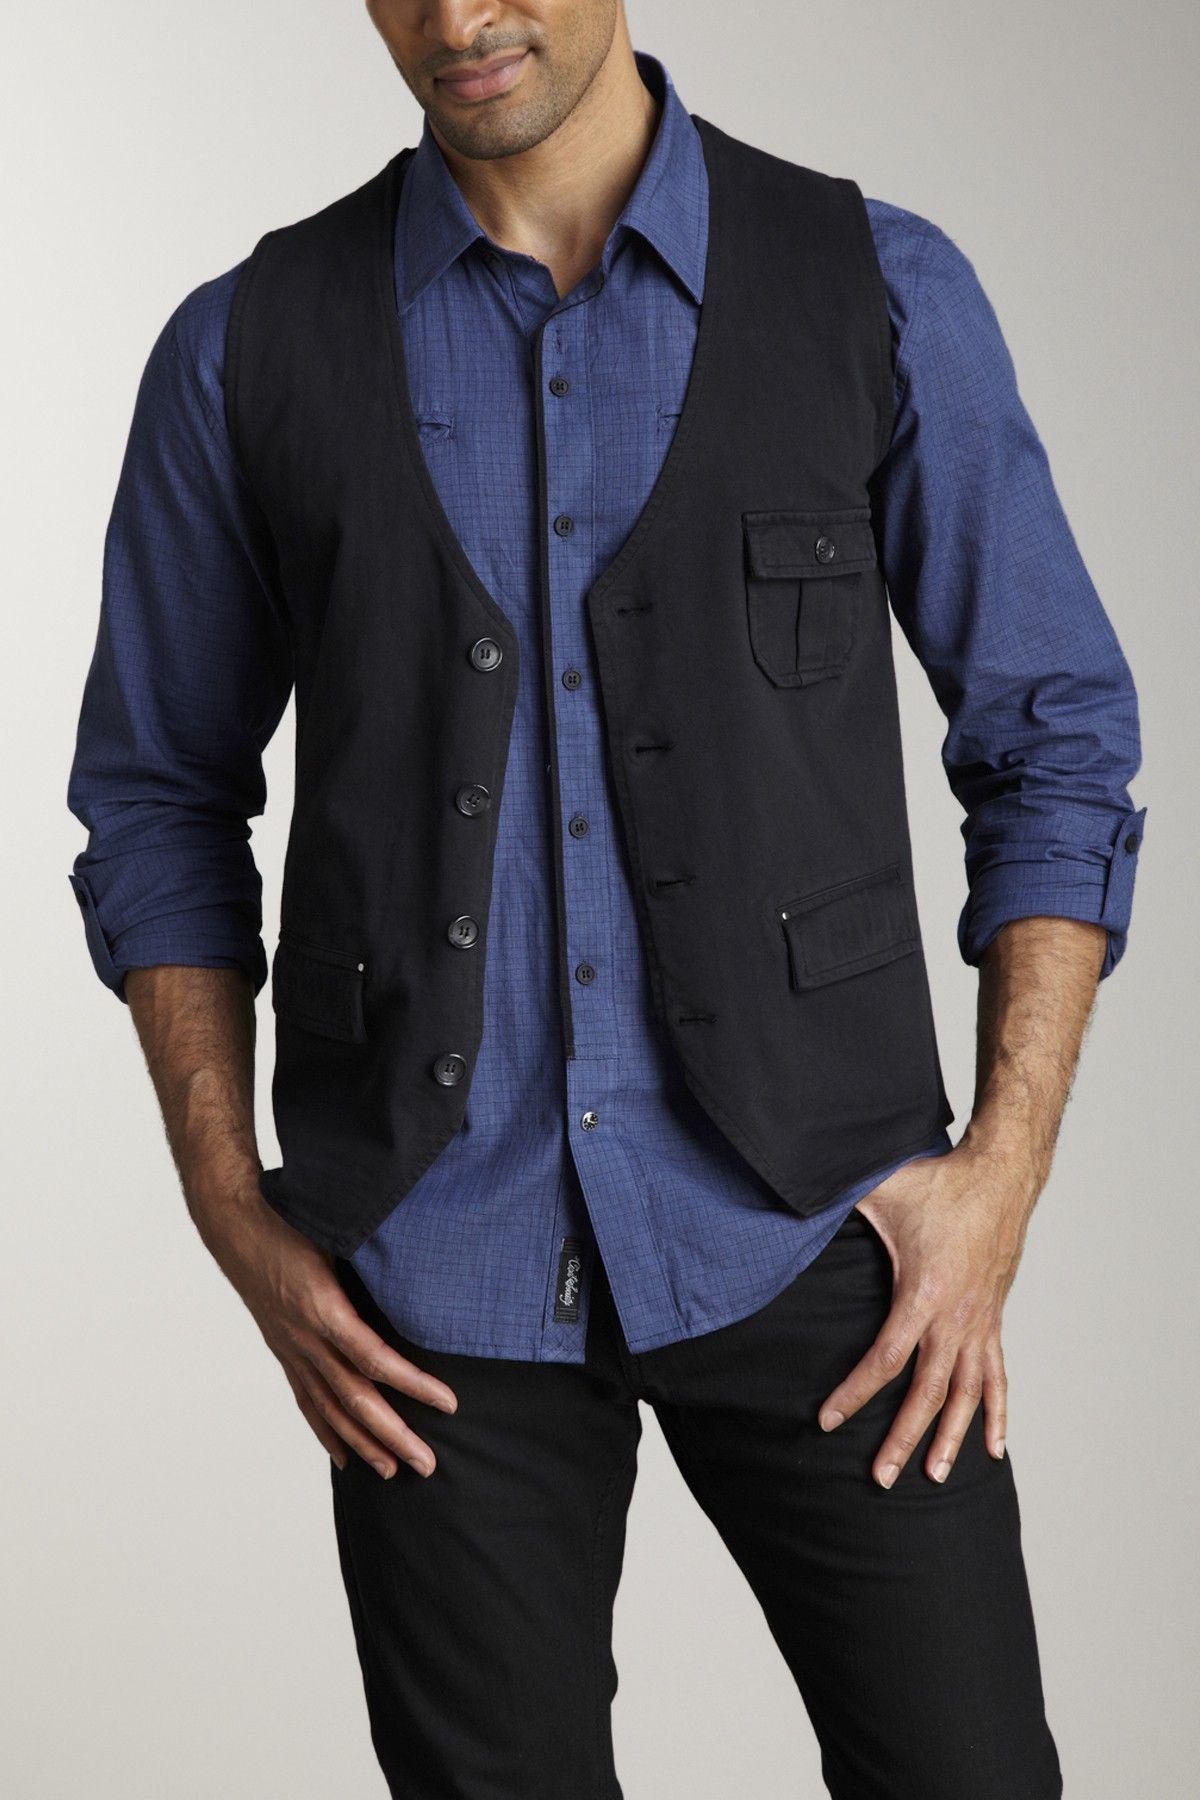 Civil Society Mumford Vest Plus size mens clothing